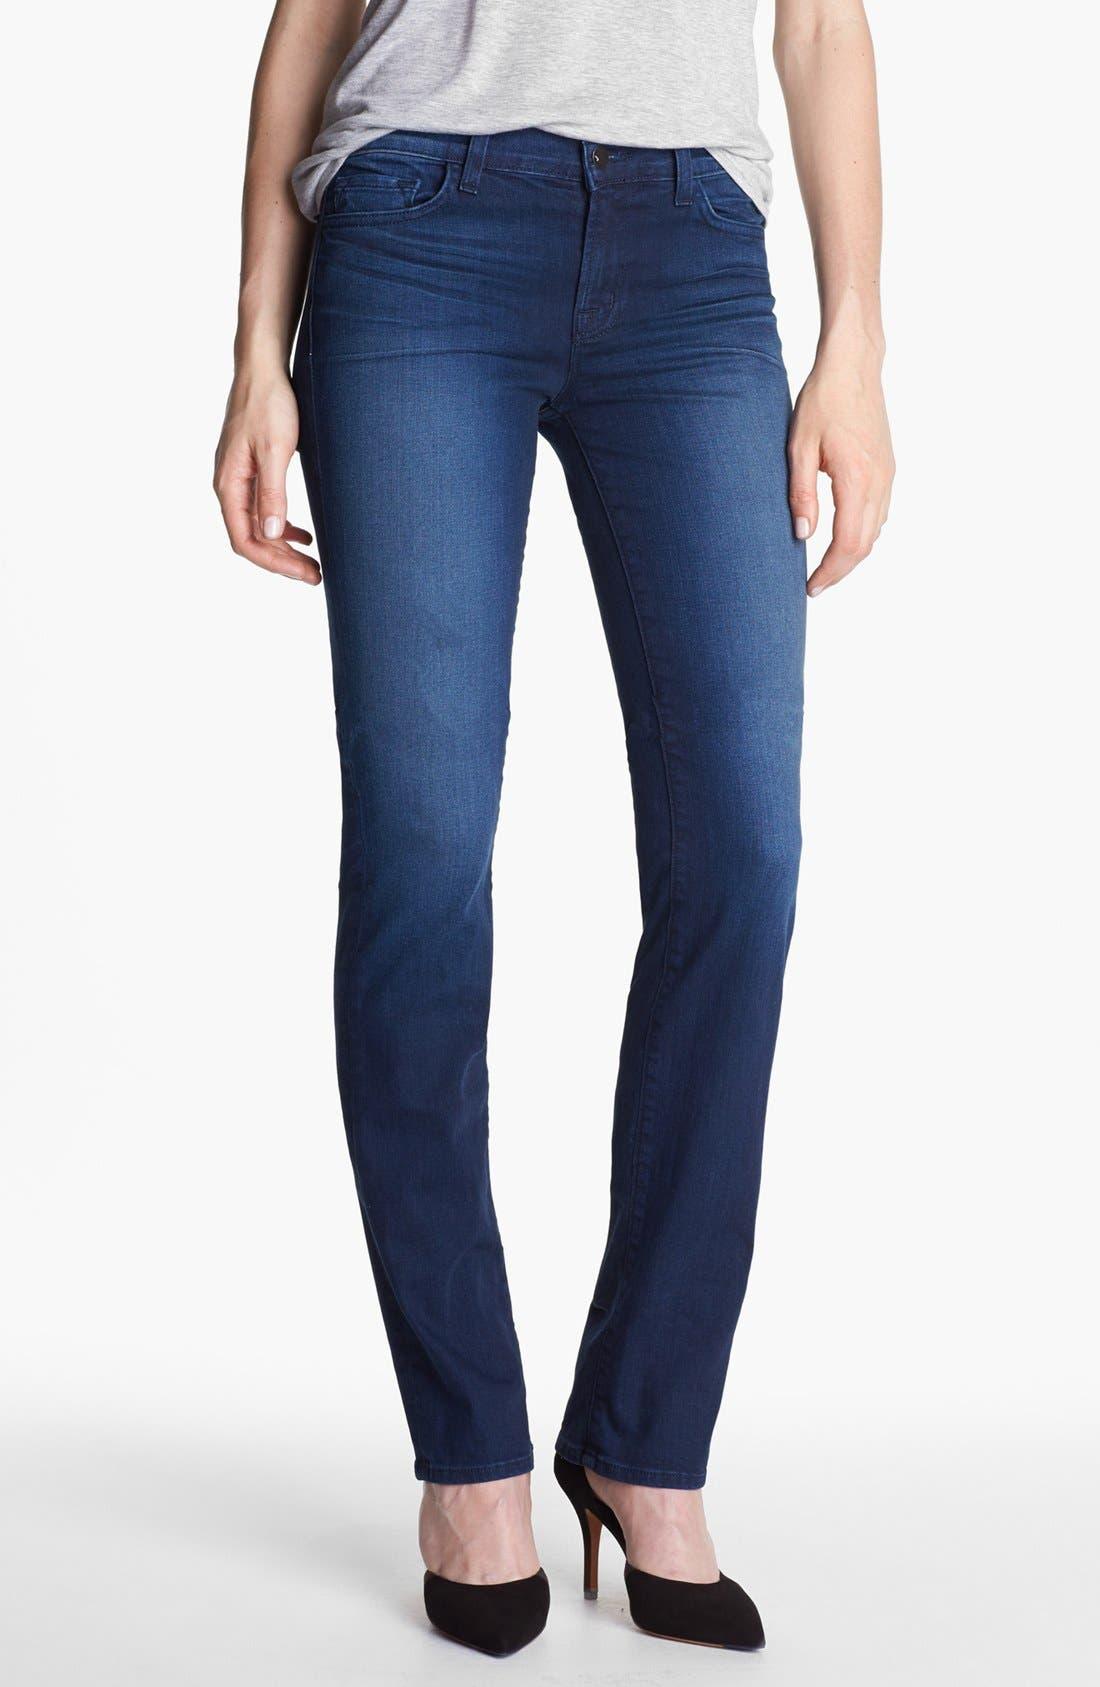 Main Image - J Brand '814' Mid-Rise Cigarette Leg Jeans (Avalon)